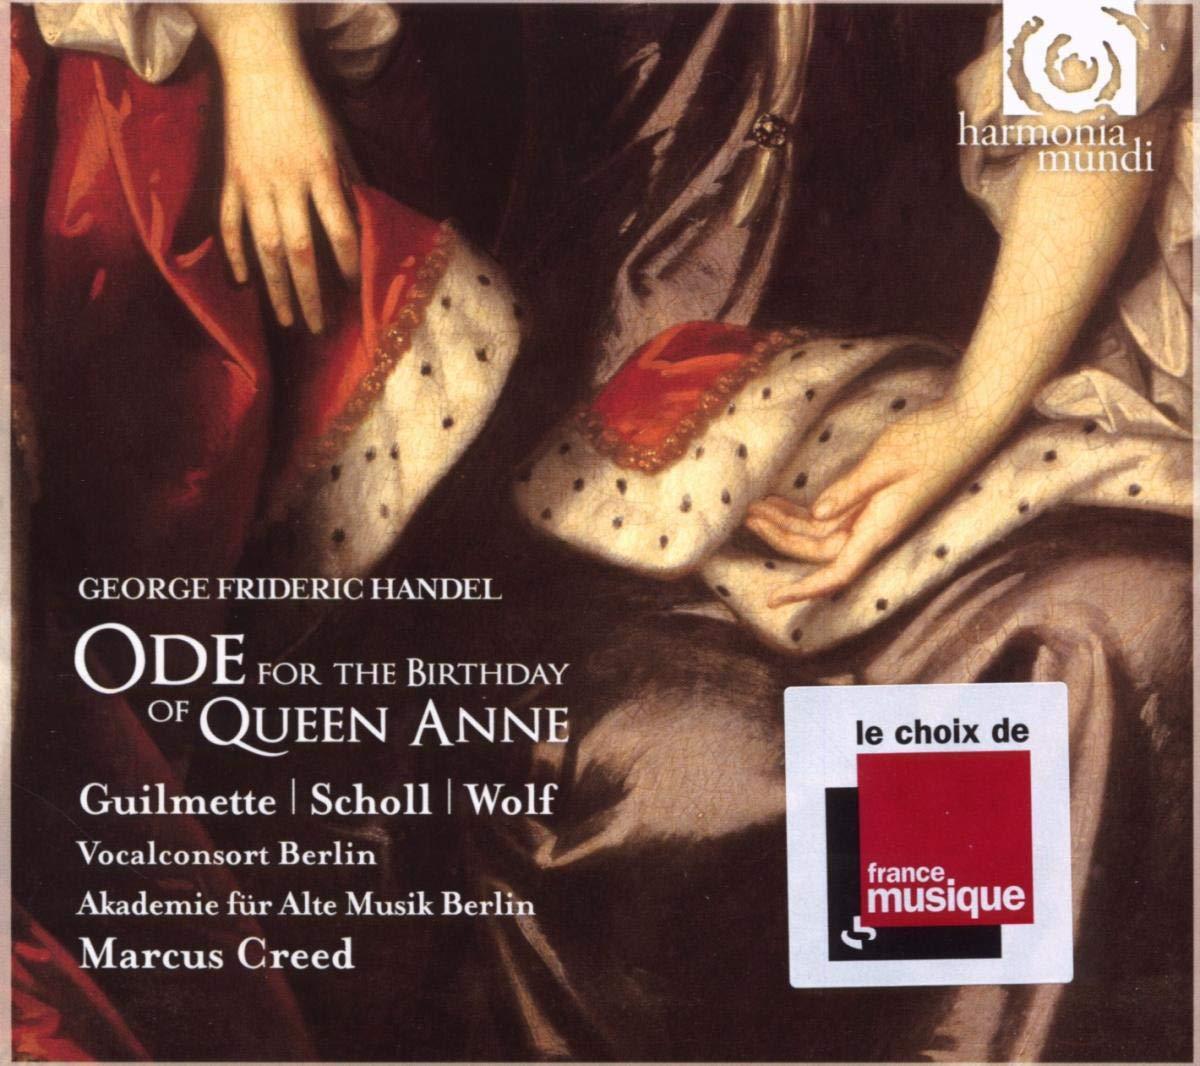 Oda Aniversario De La Reina Ana : Amazon.es: Música